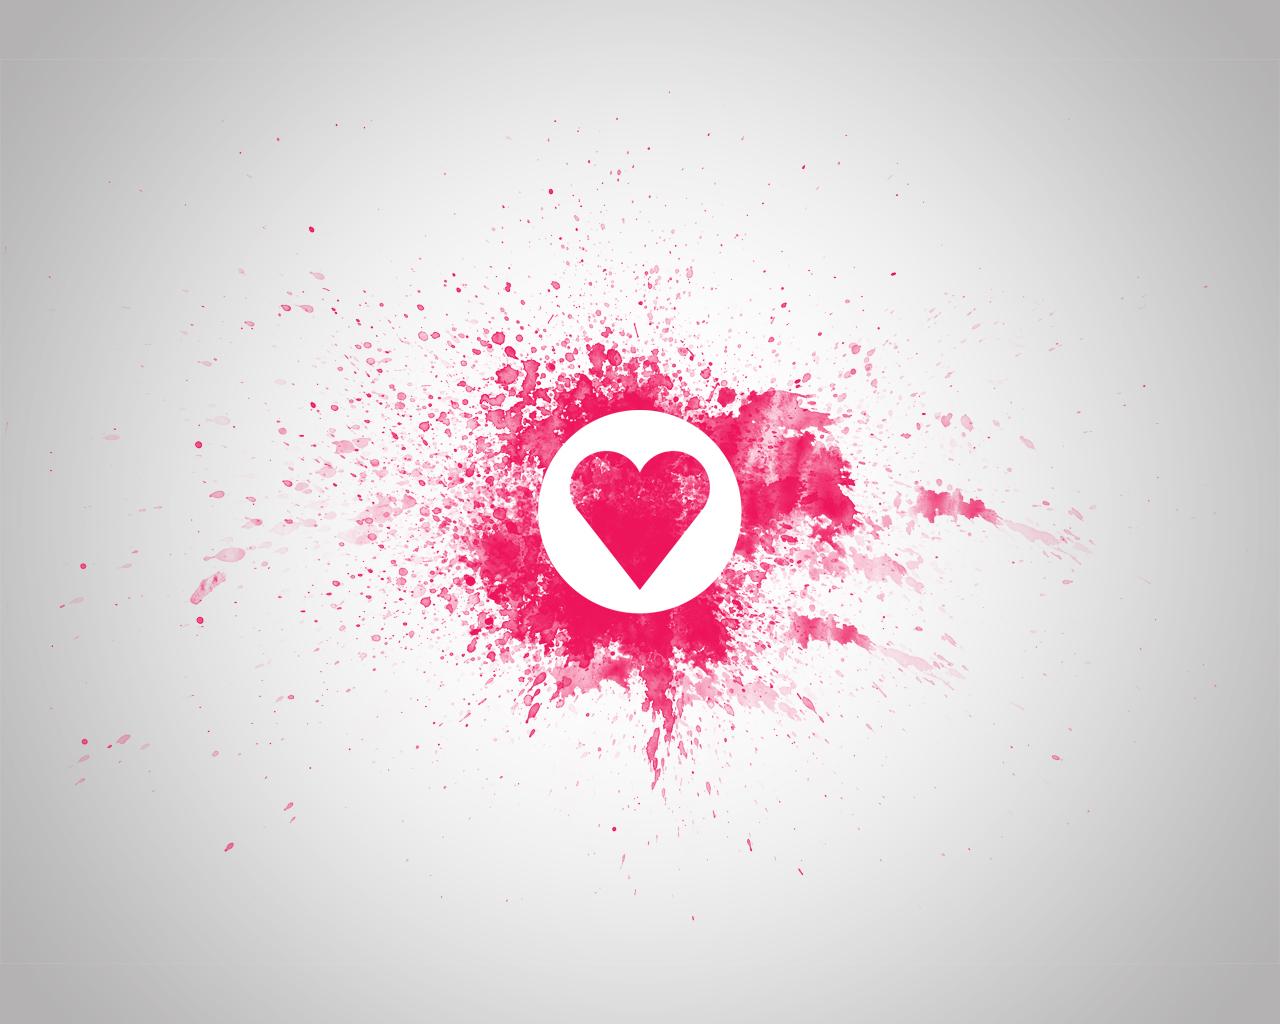 ... Love Heart Wallpaper12 ...